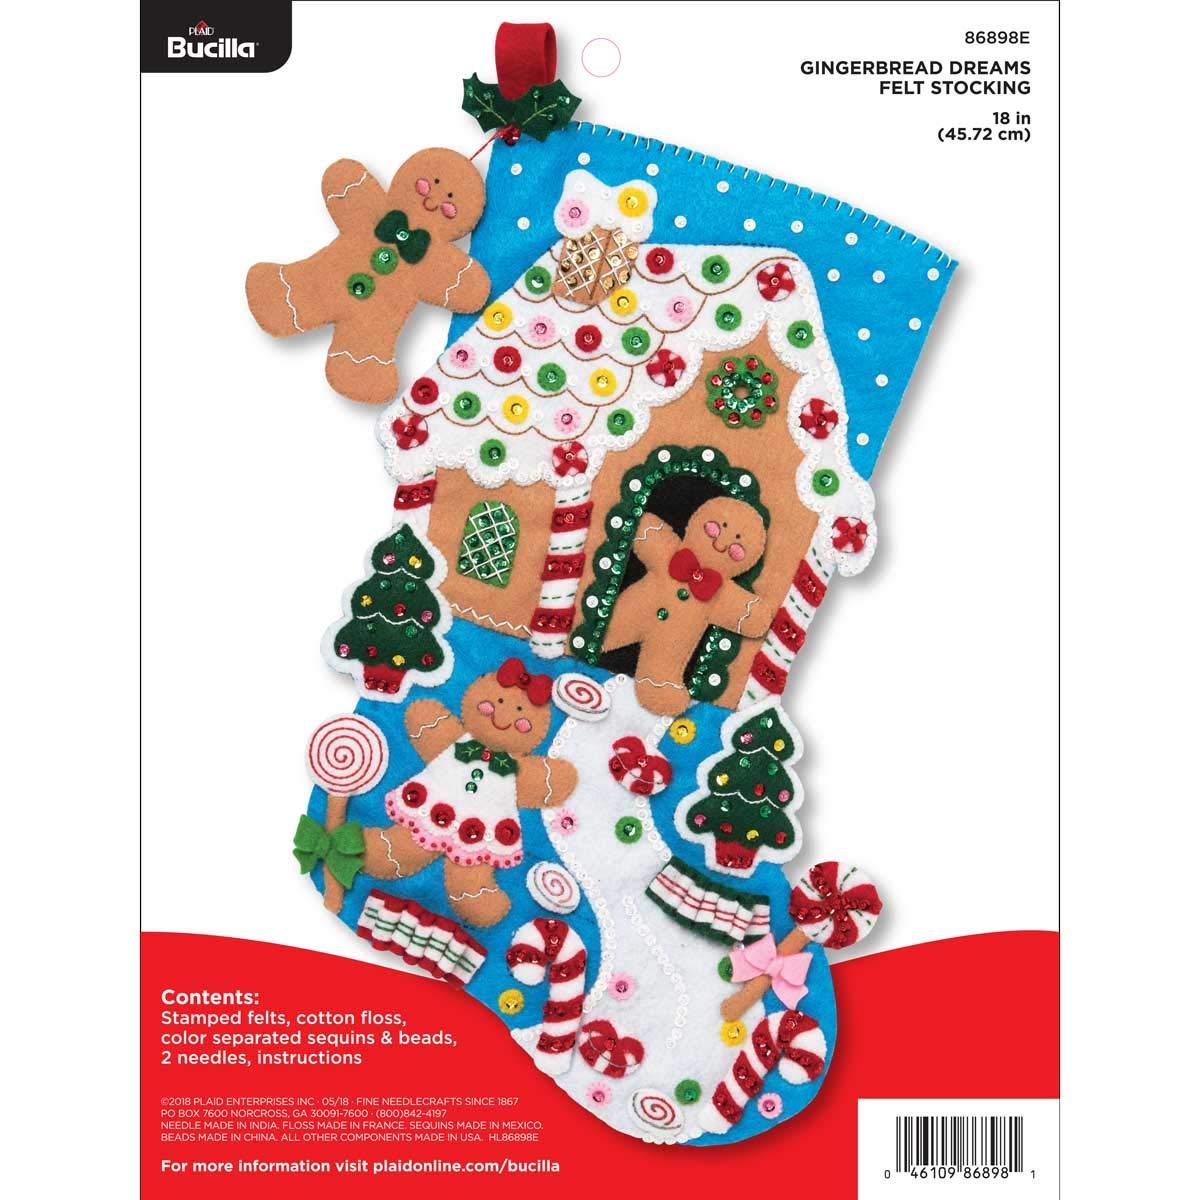 Bucilla 18-inch Christmas Stocking Felt Applique Kit, 86898E Gingerbread Dreams by Bucilla